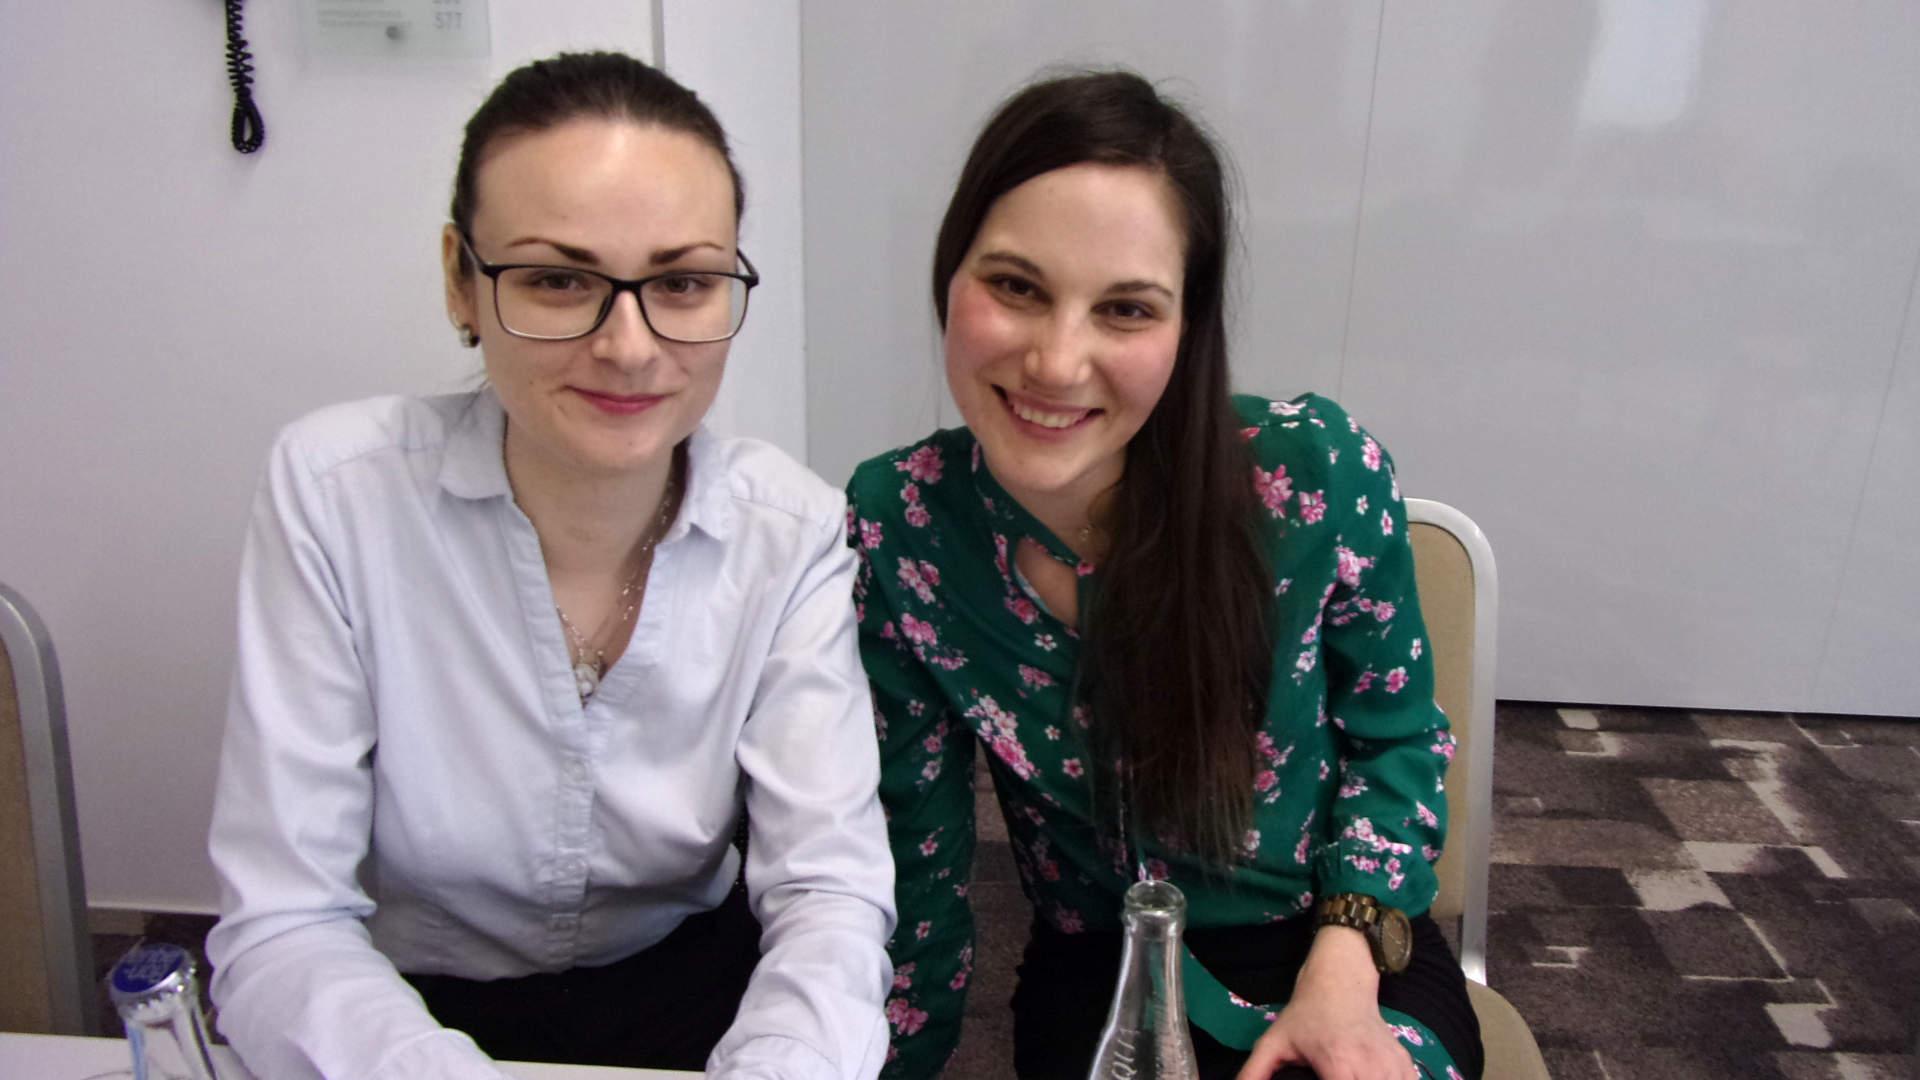 Pacientky s transplatovanými játry Kristýna Bravencová (vlevo) a Lucie Štrublová